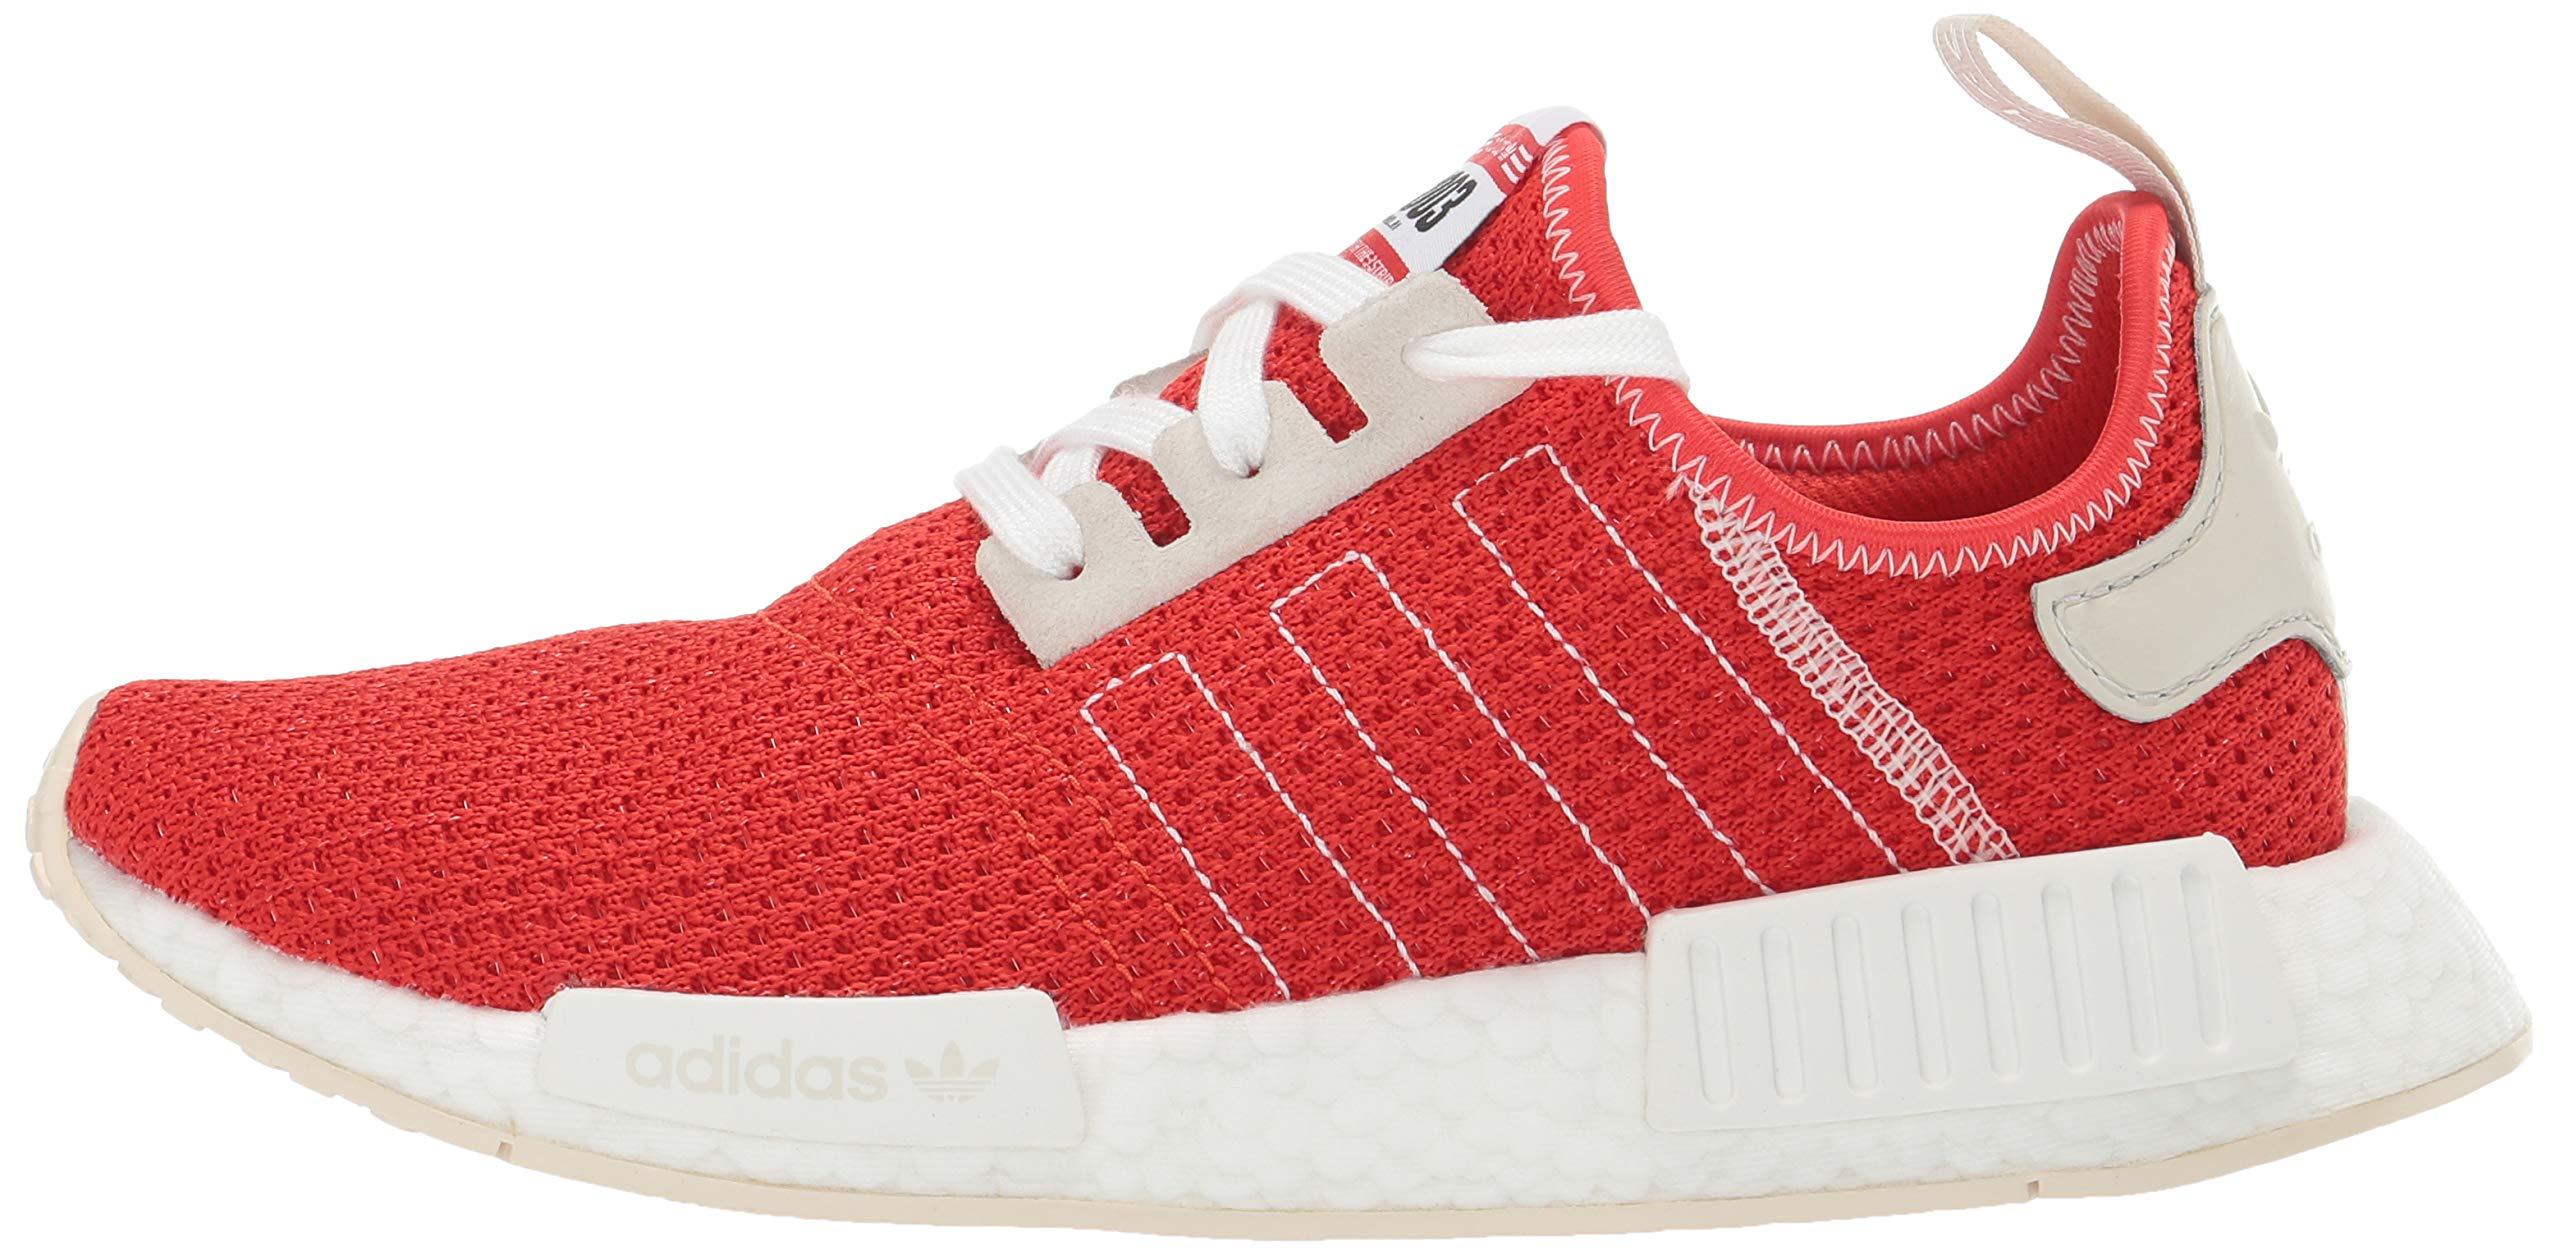 adidas Originals Men's NMD_R1 Running Shoe, Active red/Ecru Tint, 4 M US by adidas Originals (Image #5)